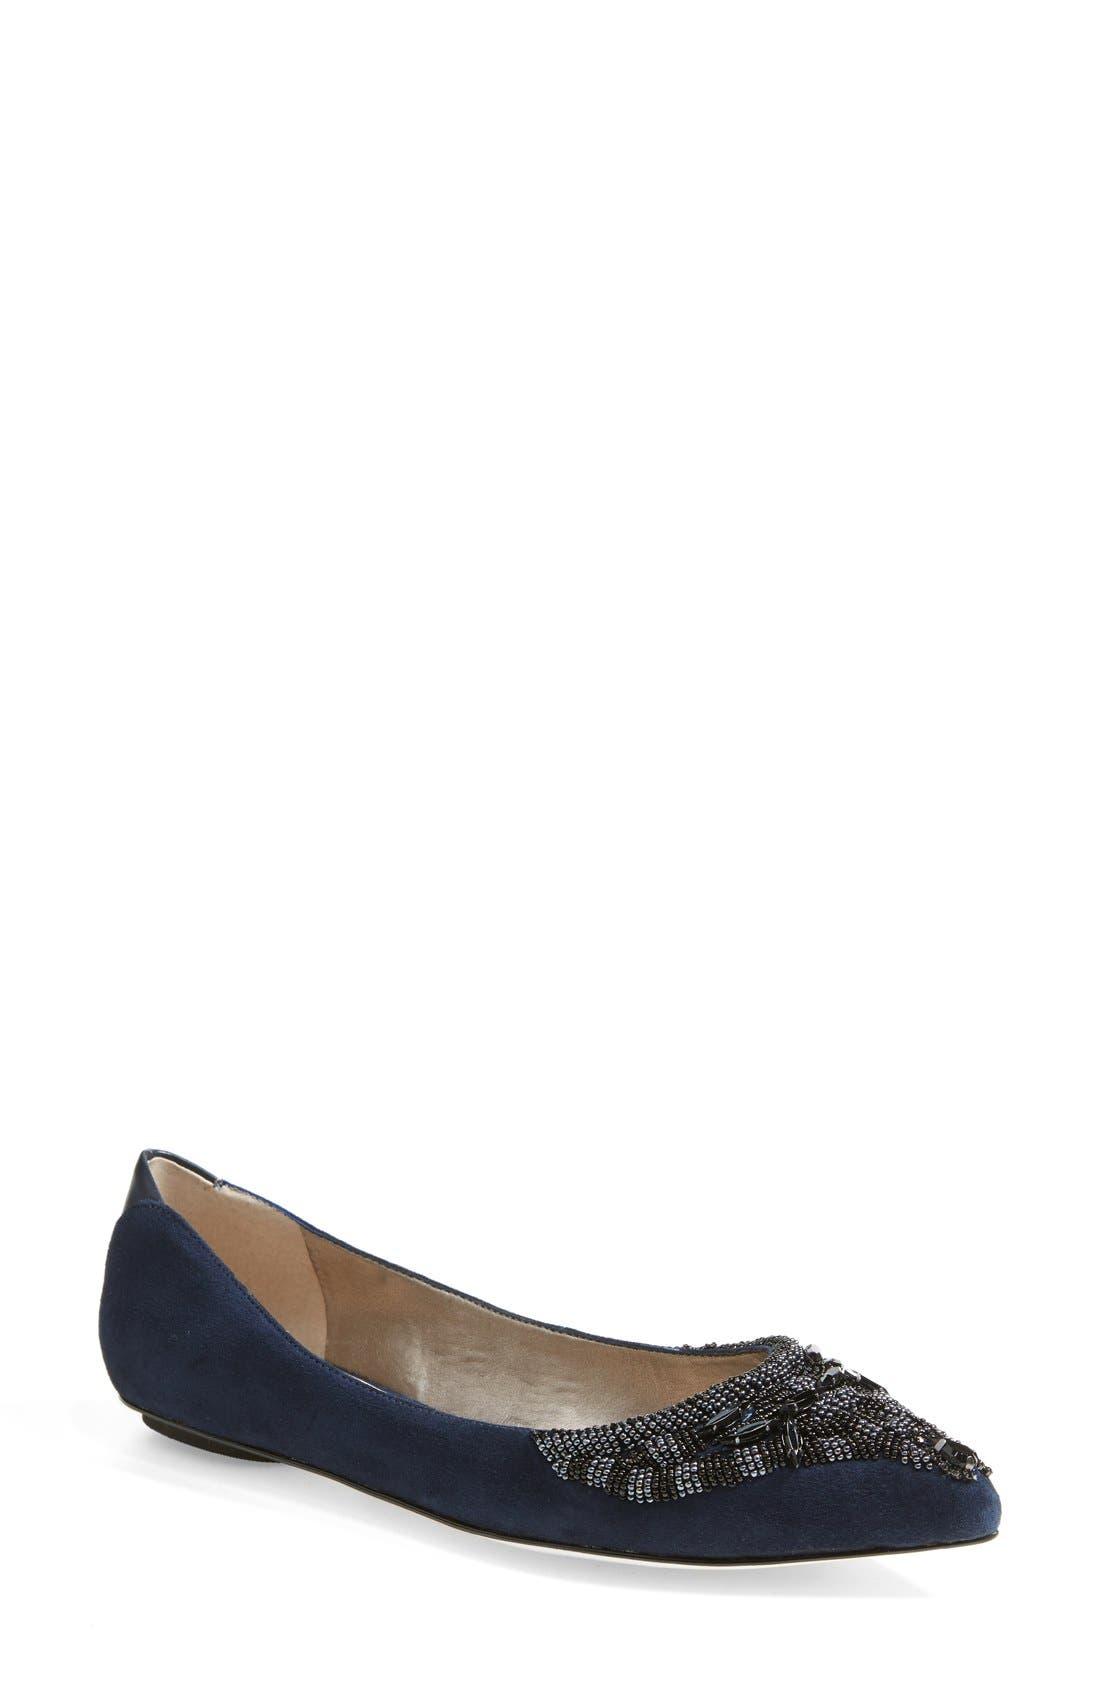 Alternate Image 1 Selected - Sam Edelman 'Cindi' Beaded Pointy Toe Flat (Women)